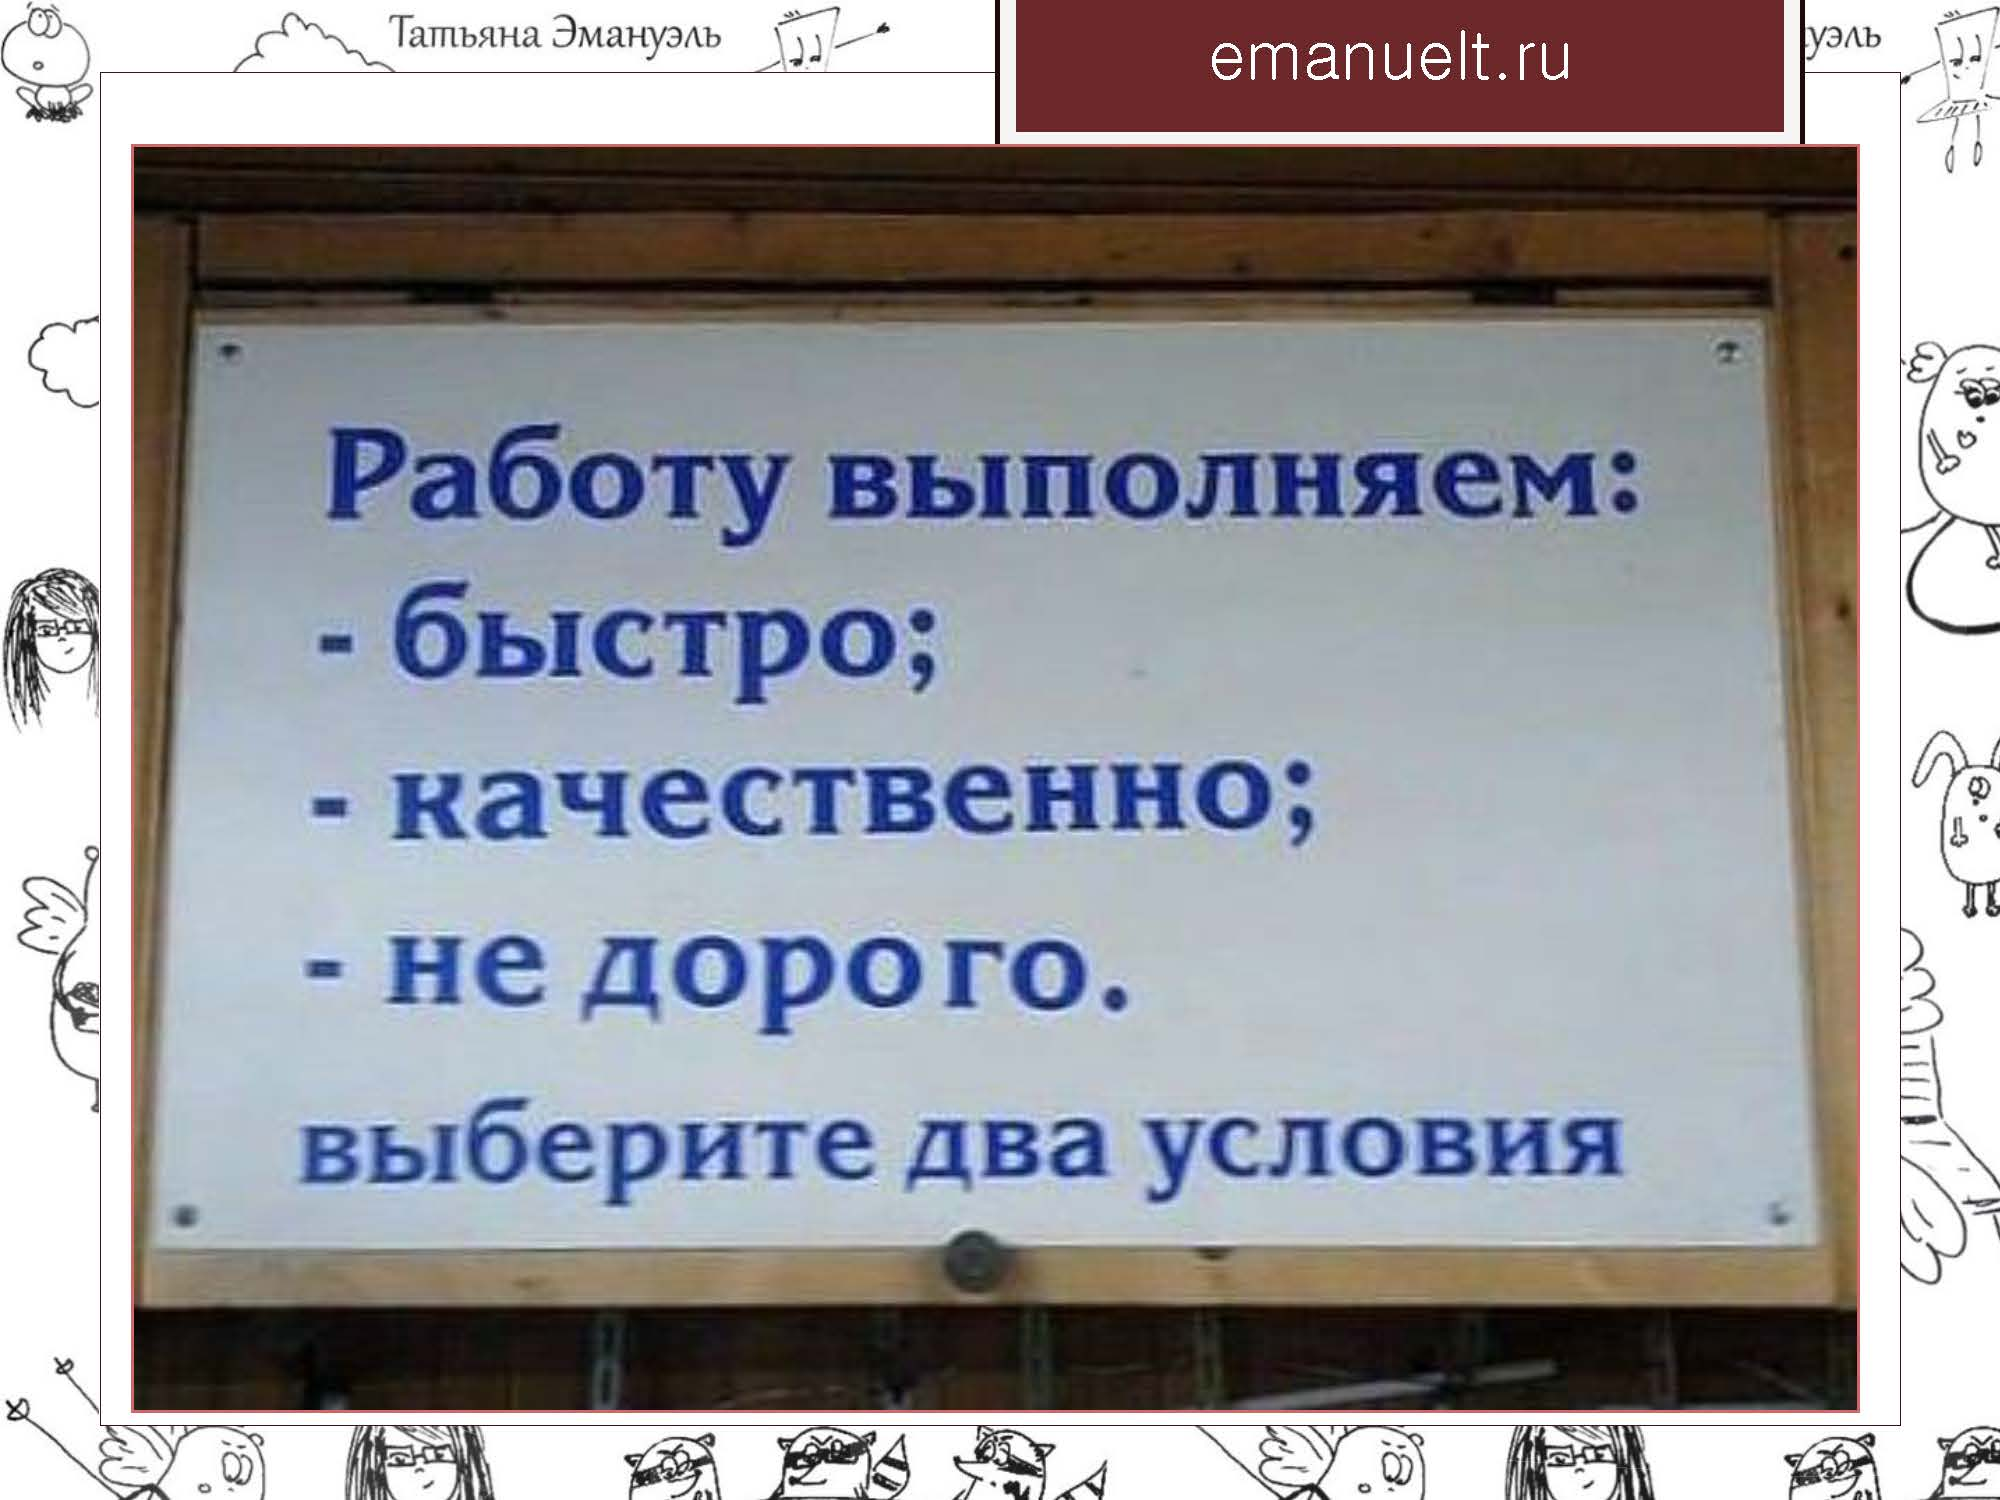 06 февраля эмануэль_Страница_036